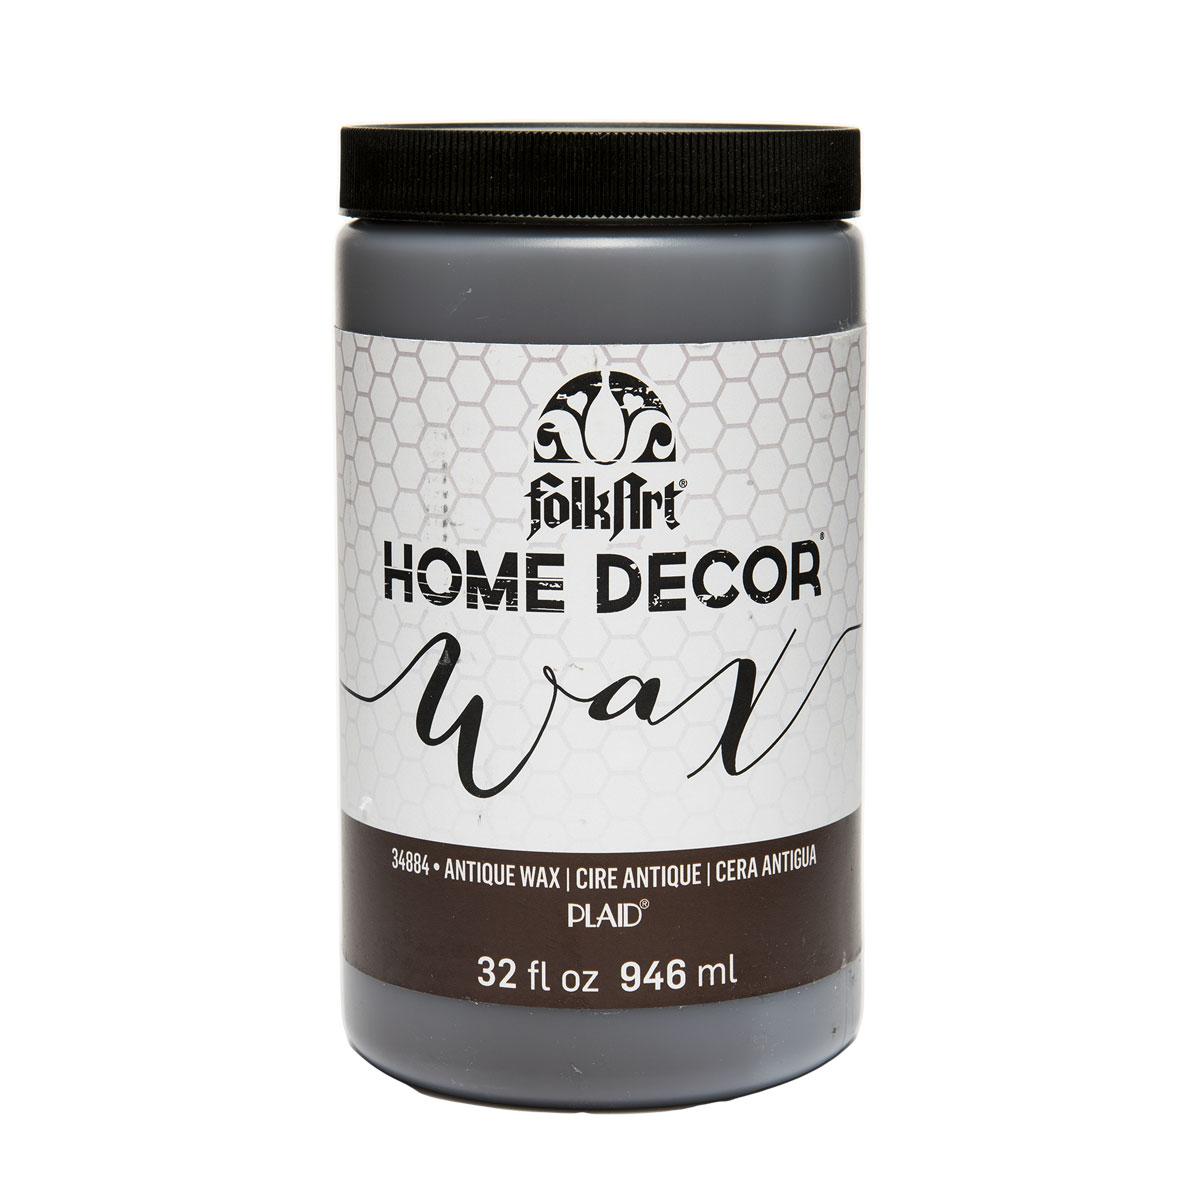 FolkArt ® Home Decor™ Wax - Antiquing, 32 oz.